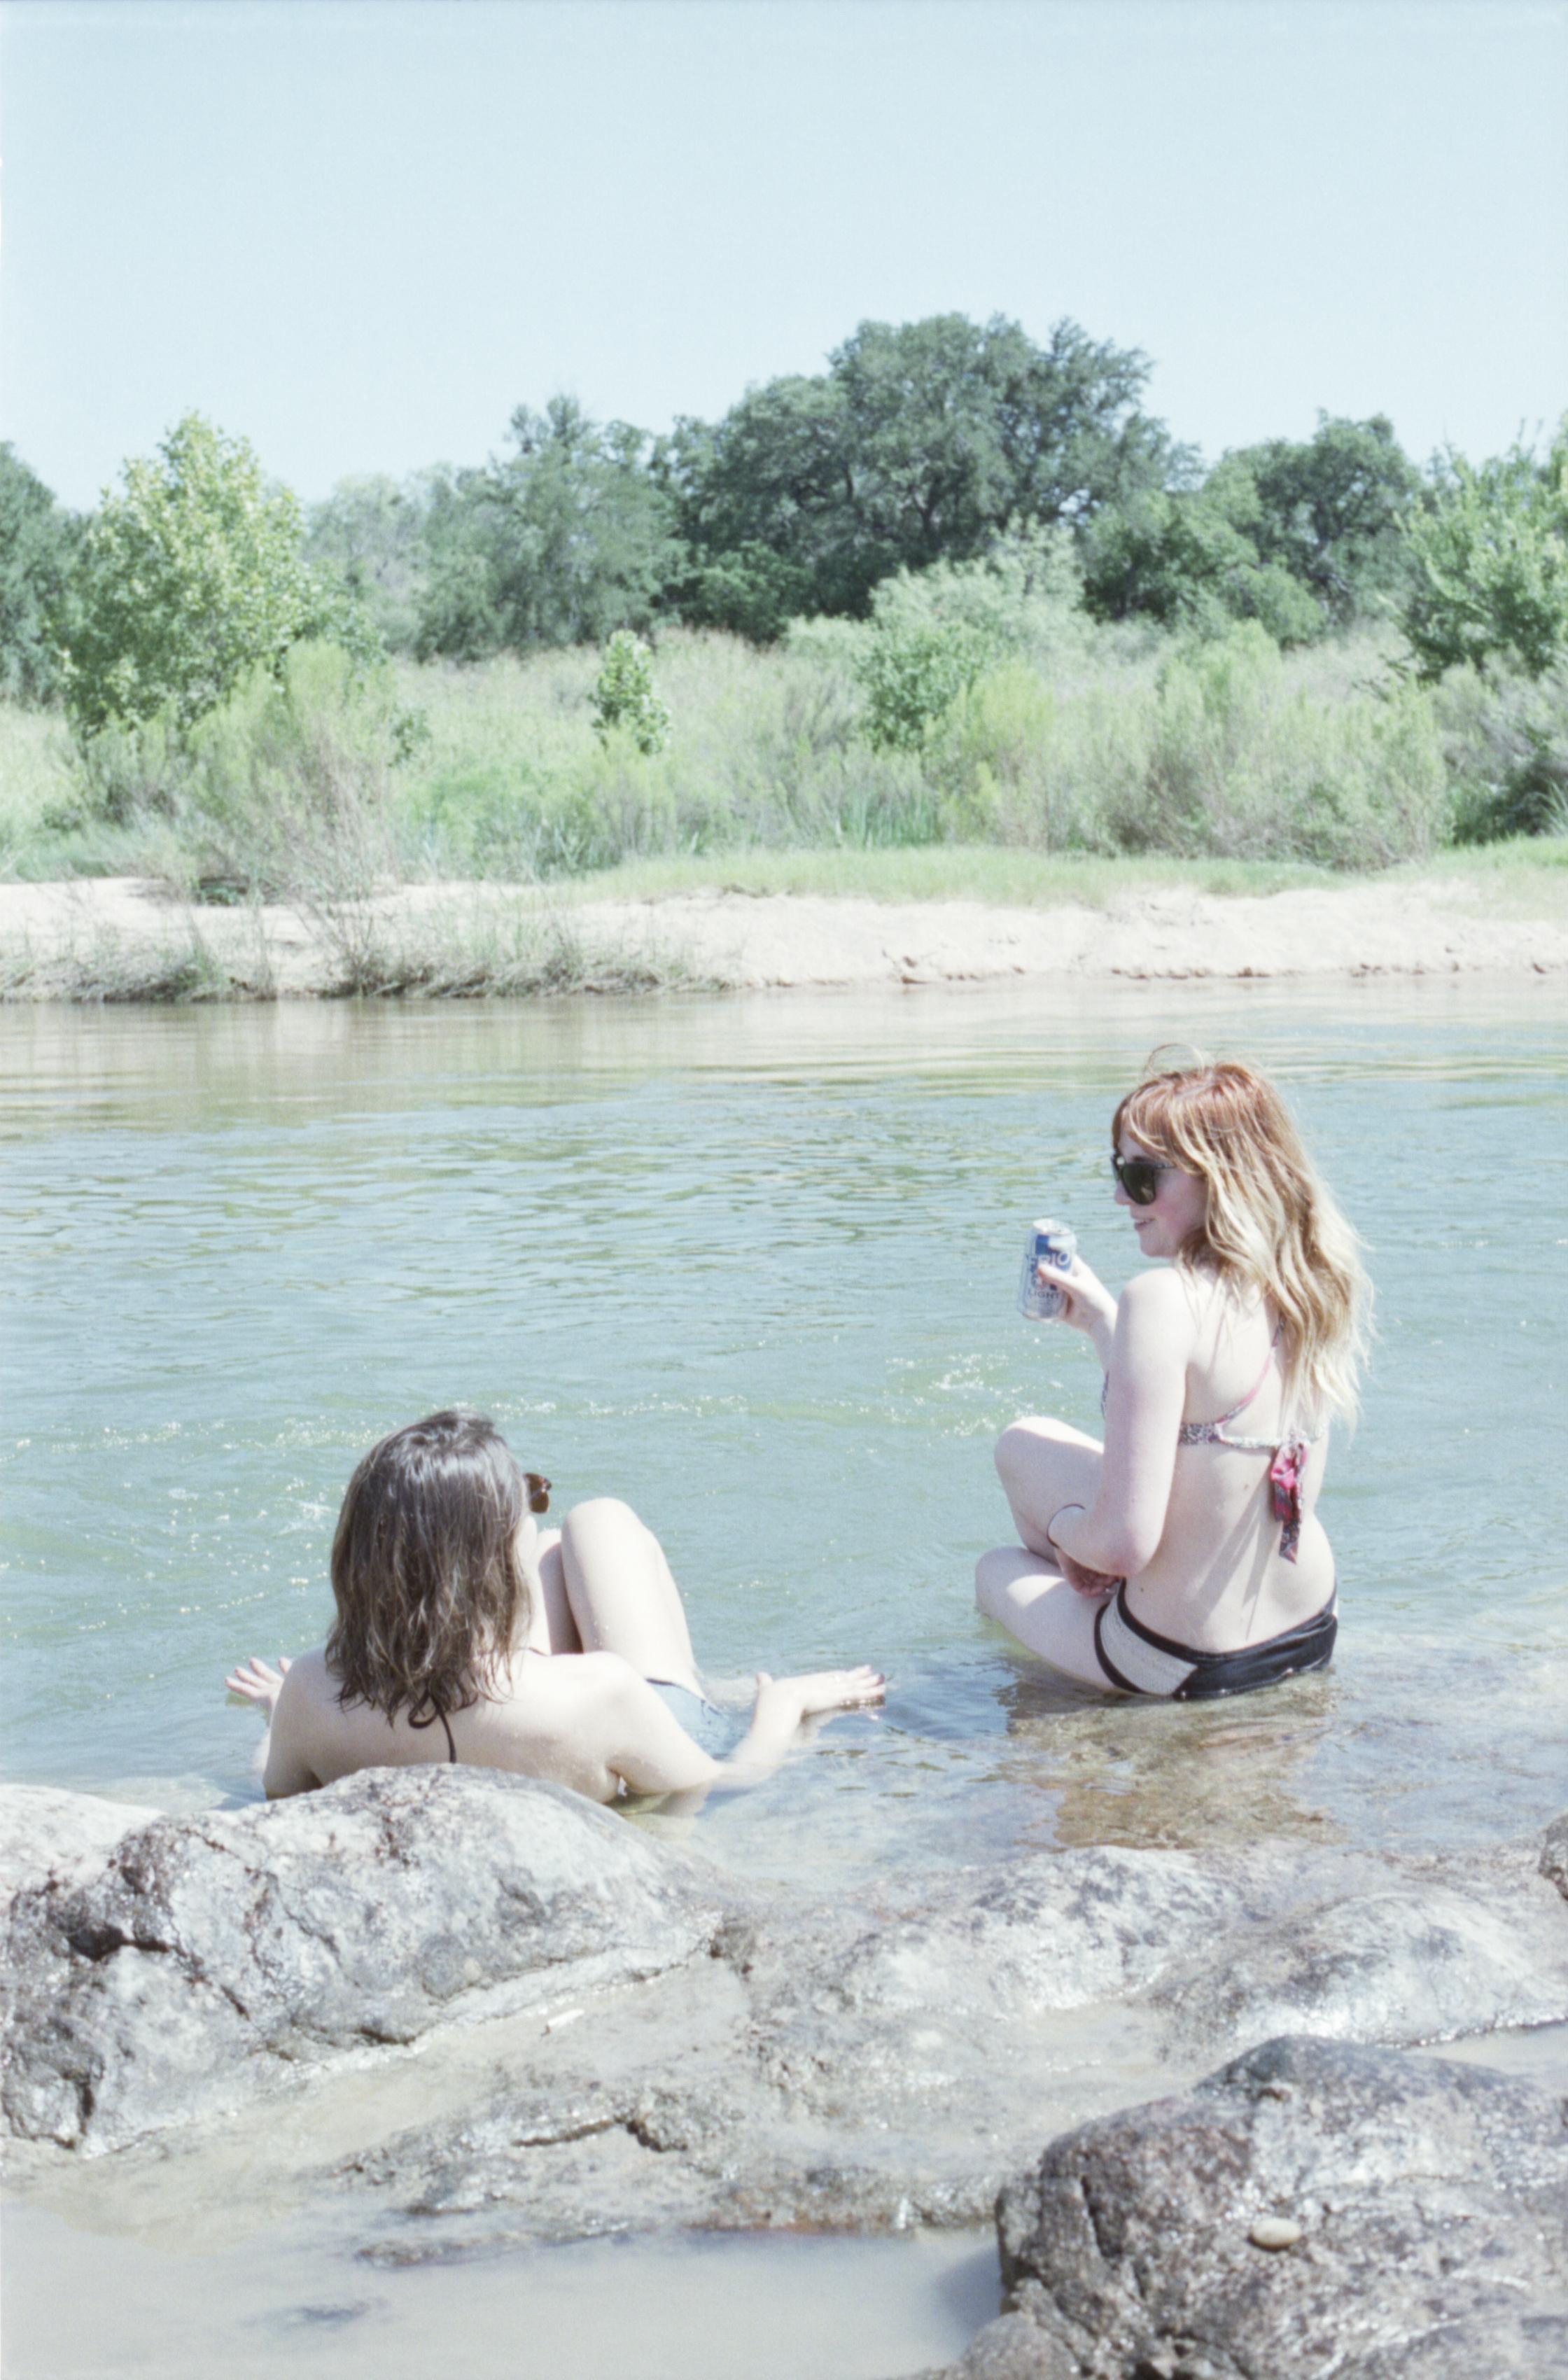 water swim swimming llano texas camp america 35mm